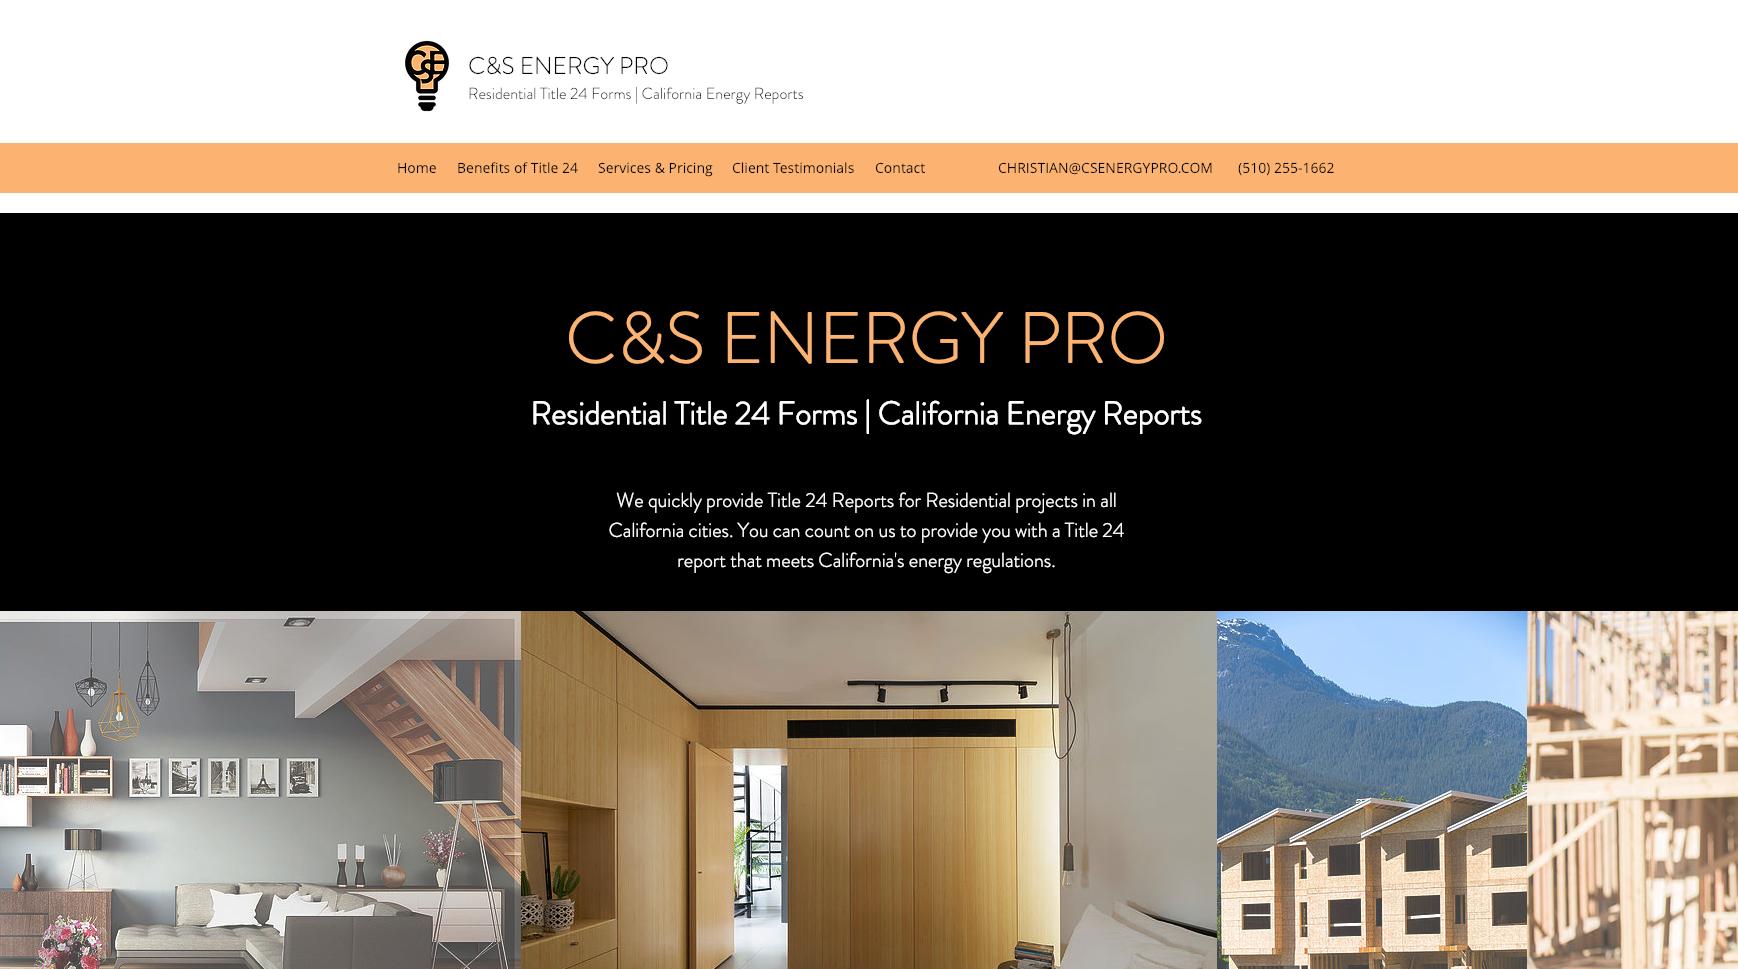 Company: C&S ENERGY PRO thumbnail